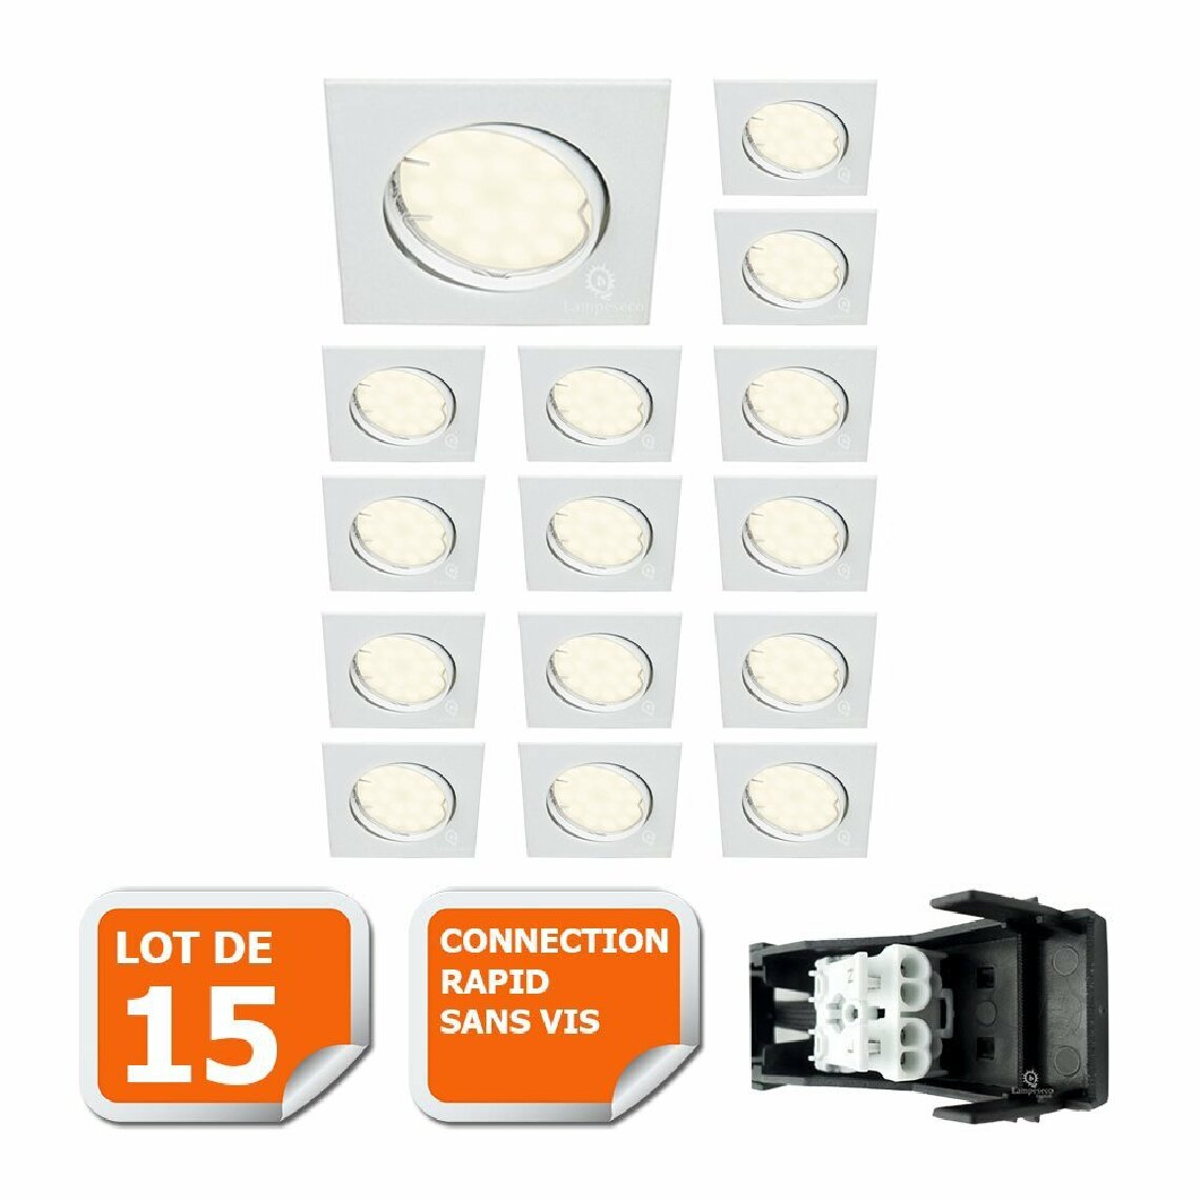 Lampesecoenergie LOT DE 15 SPOT ENCASTRABLE ORIENTABLE CARRE LED SMD GU10 230V BLANC RENDU ENVIRON 50W HALOGENE